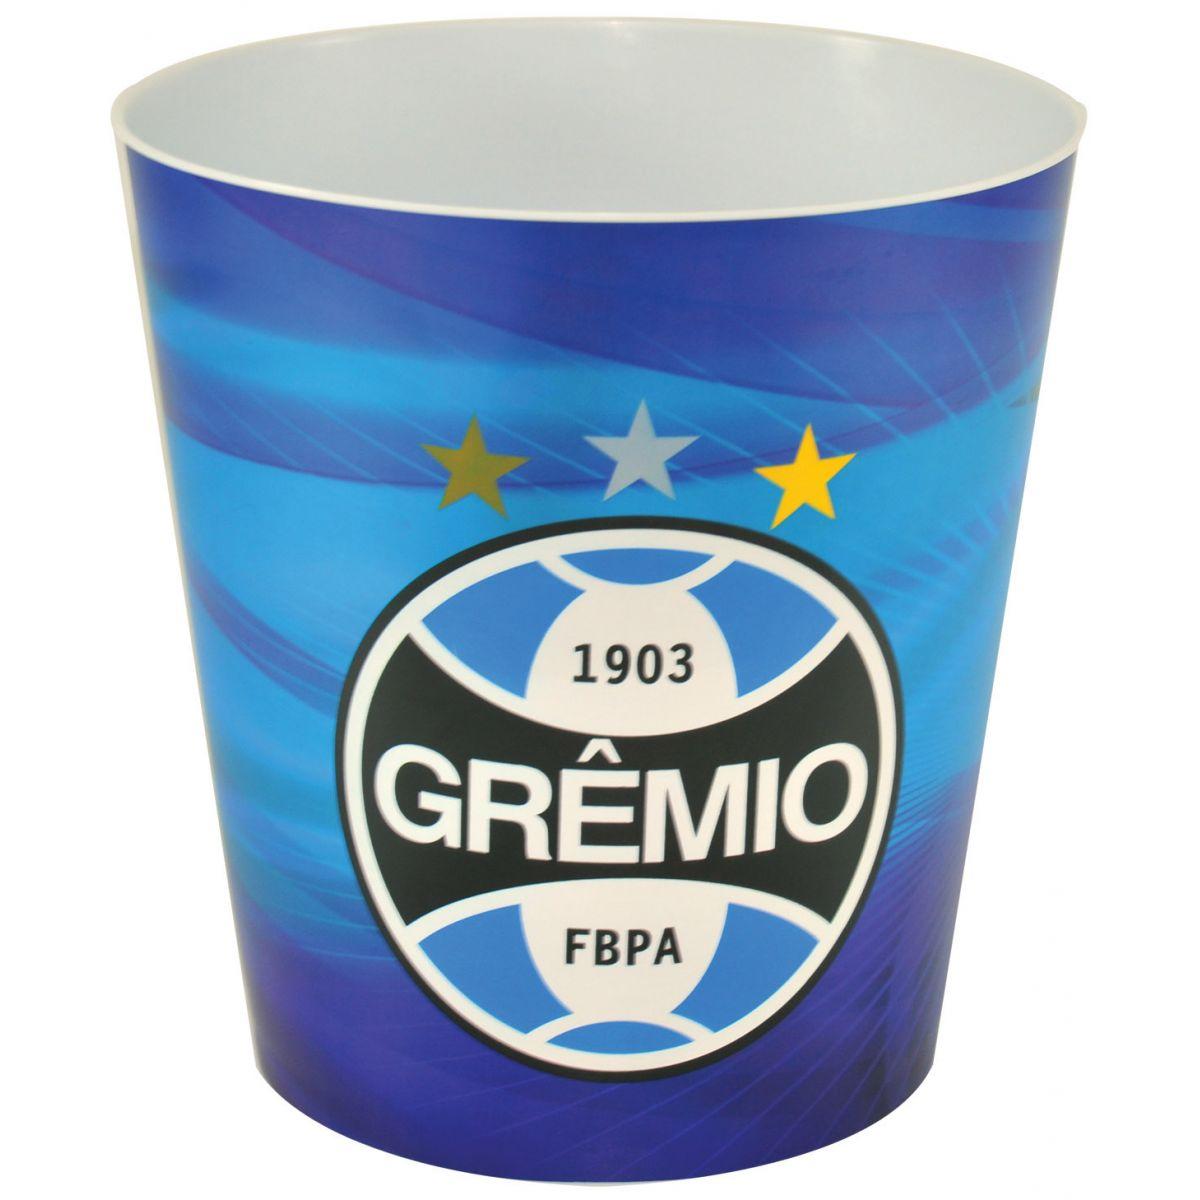 Balde p/ pipoca do Grêmio + 3 pipocas de micro-ondas sabor Manteiga